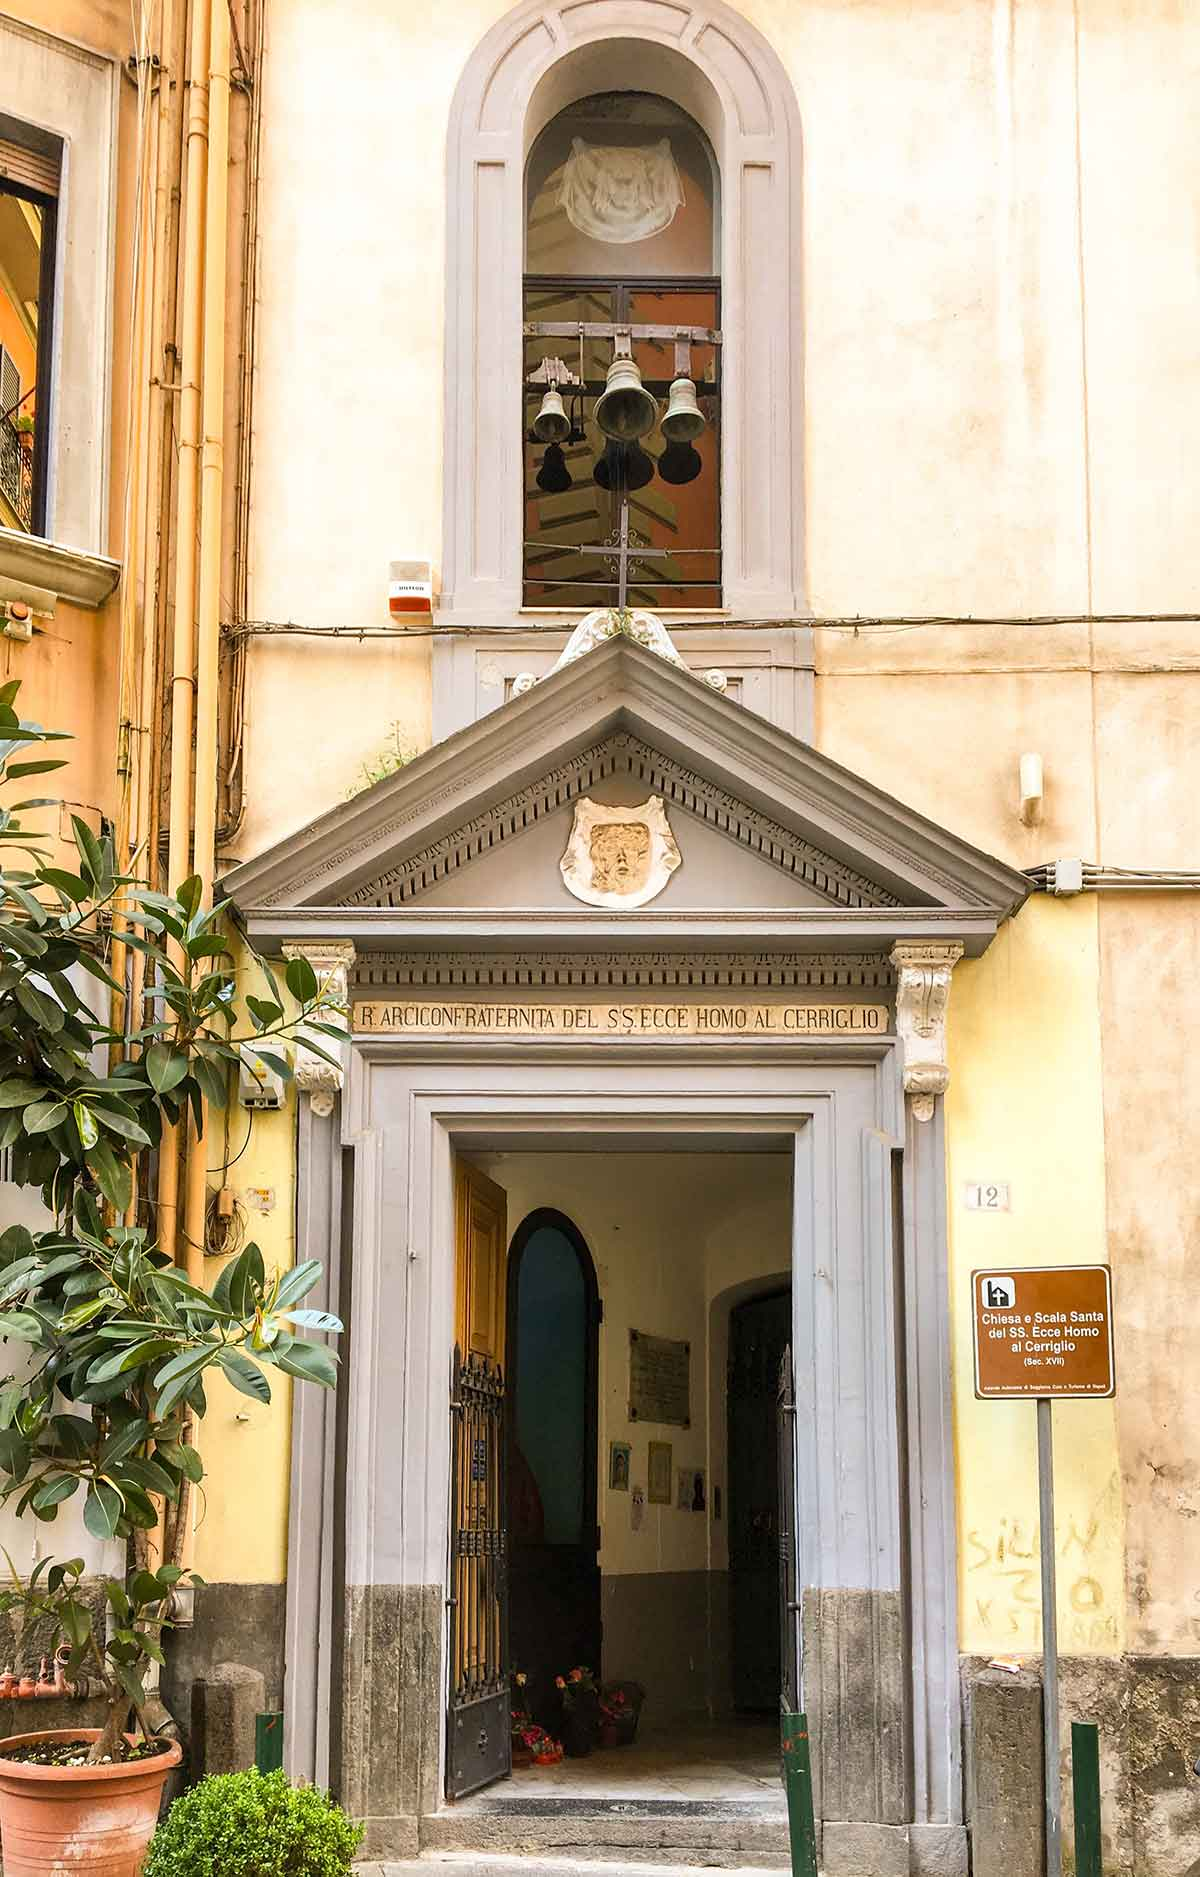 Ecce Homo al Cerriglio Scala santa